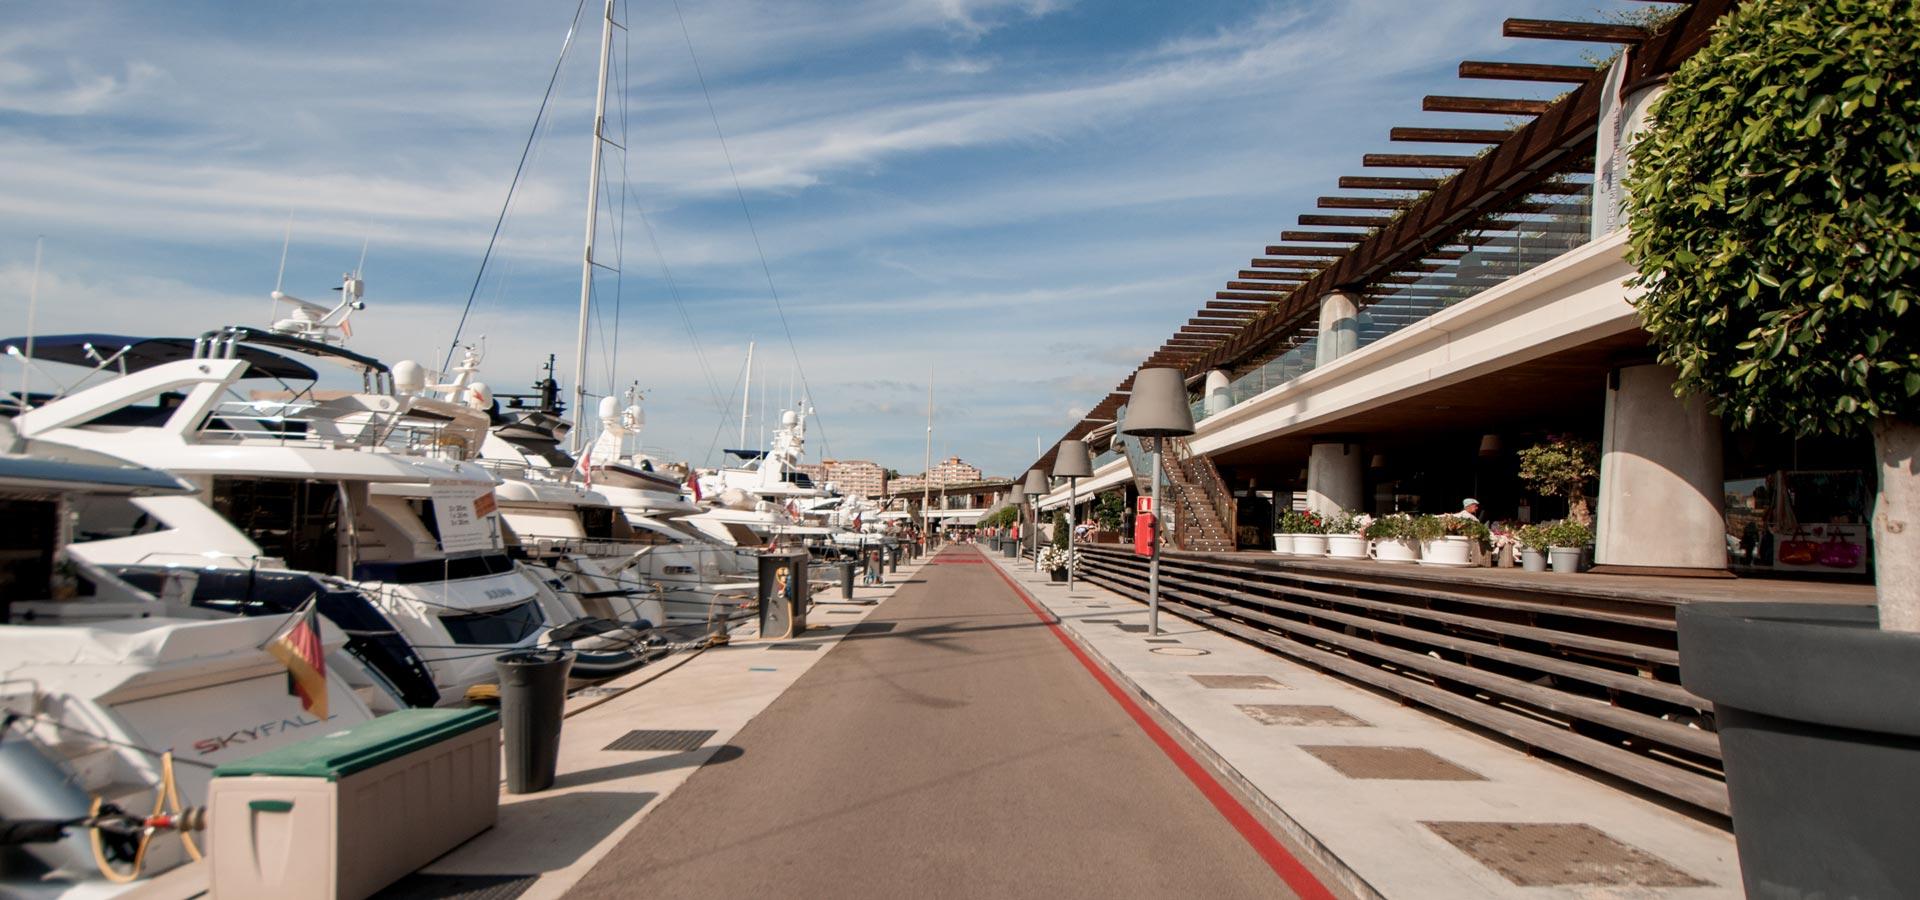 EL Toro property owners enjoy Port Adriano.